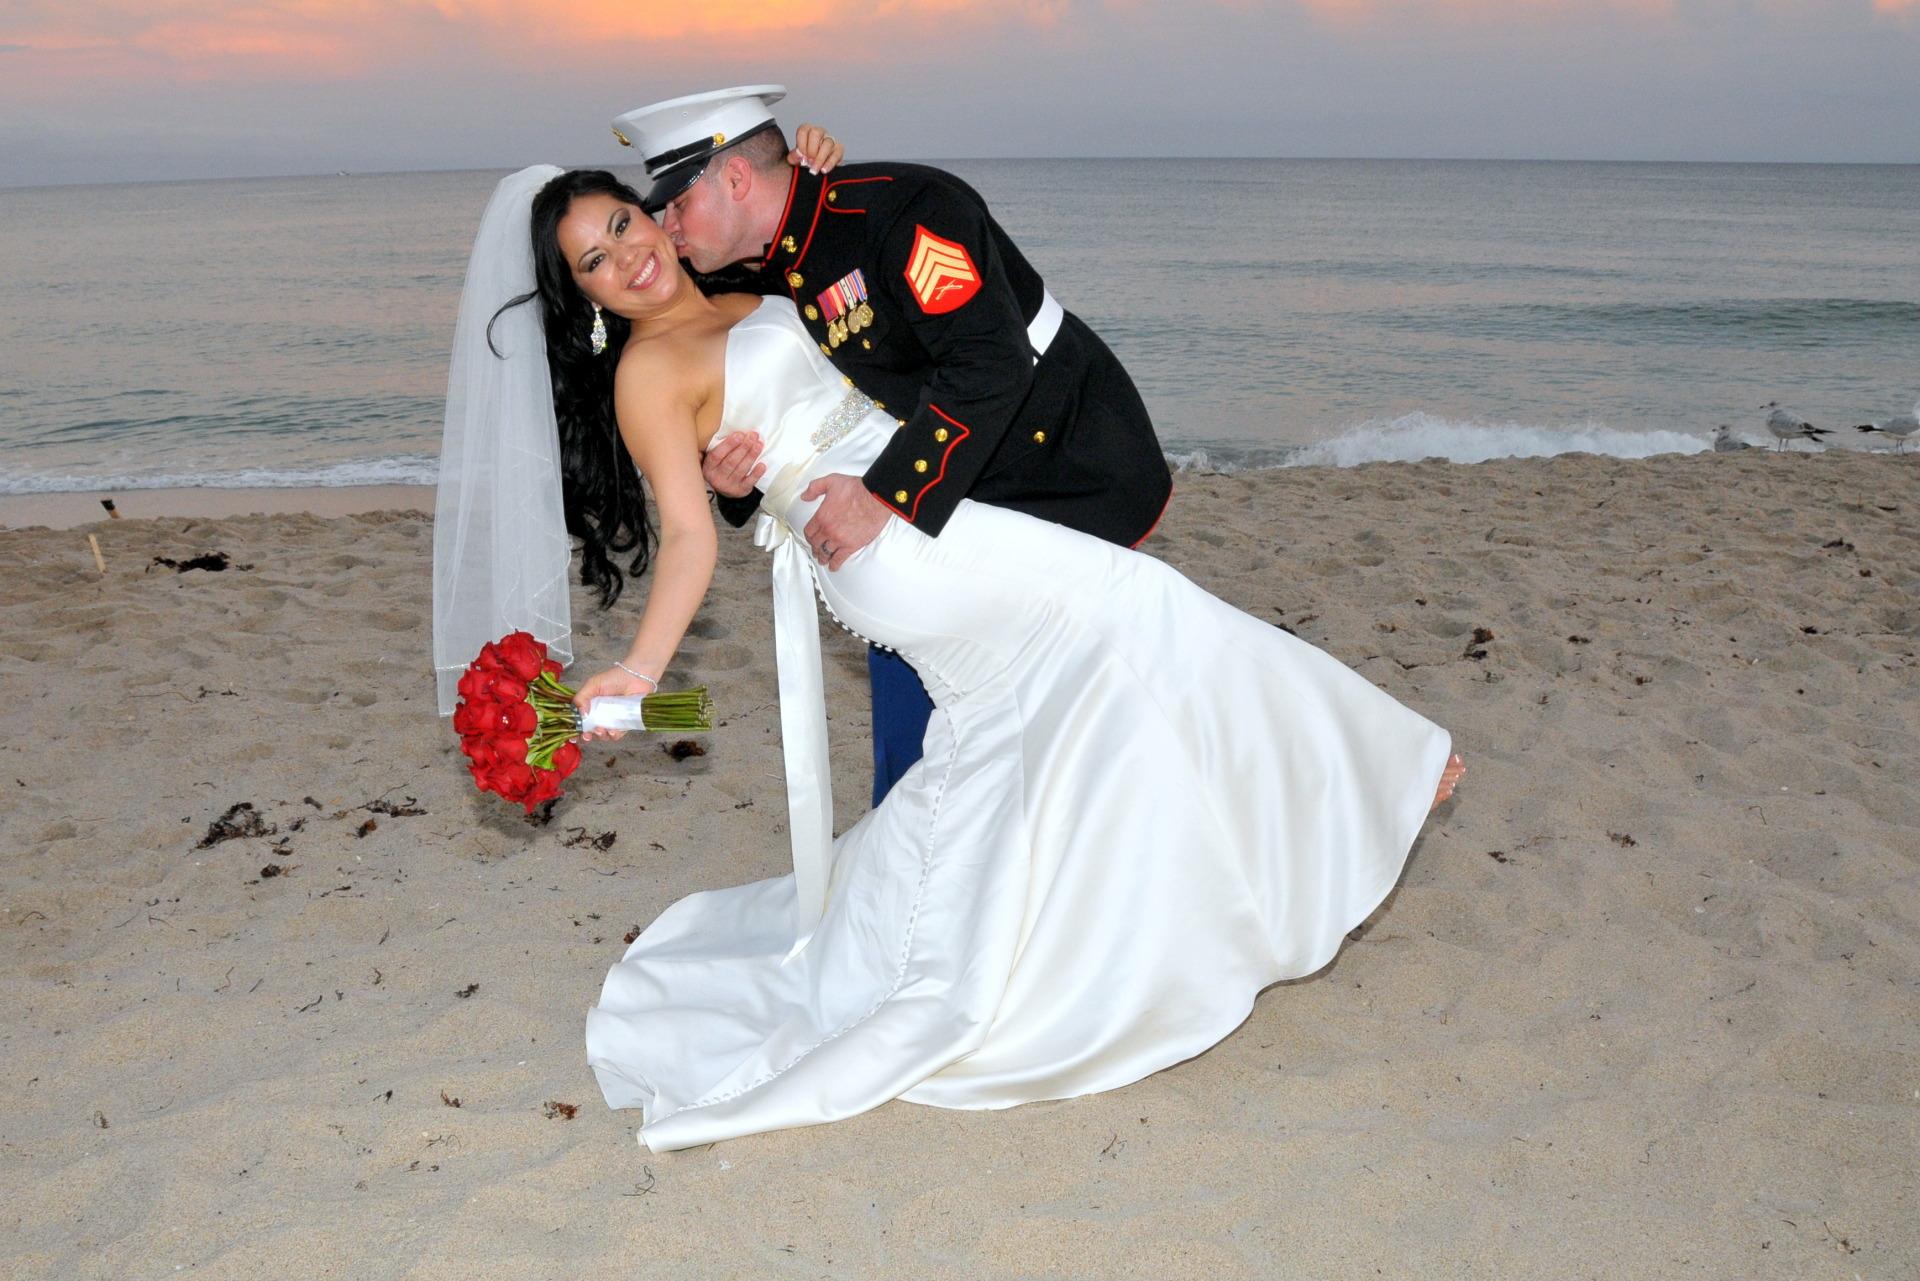 bride, bridal, photography, photos, wedding, video, wpb, west palm beach, florida, south florida, palm beach gardens, engagement photo shoot